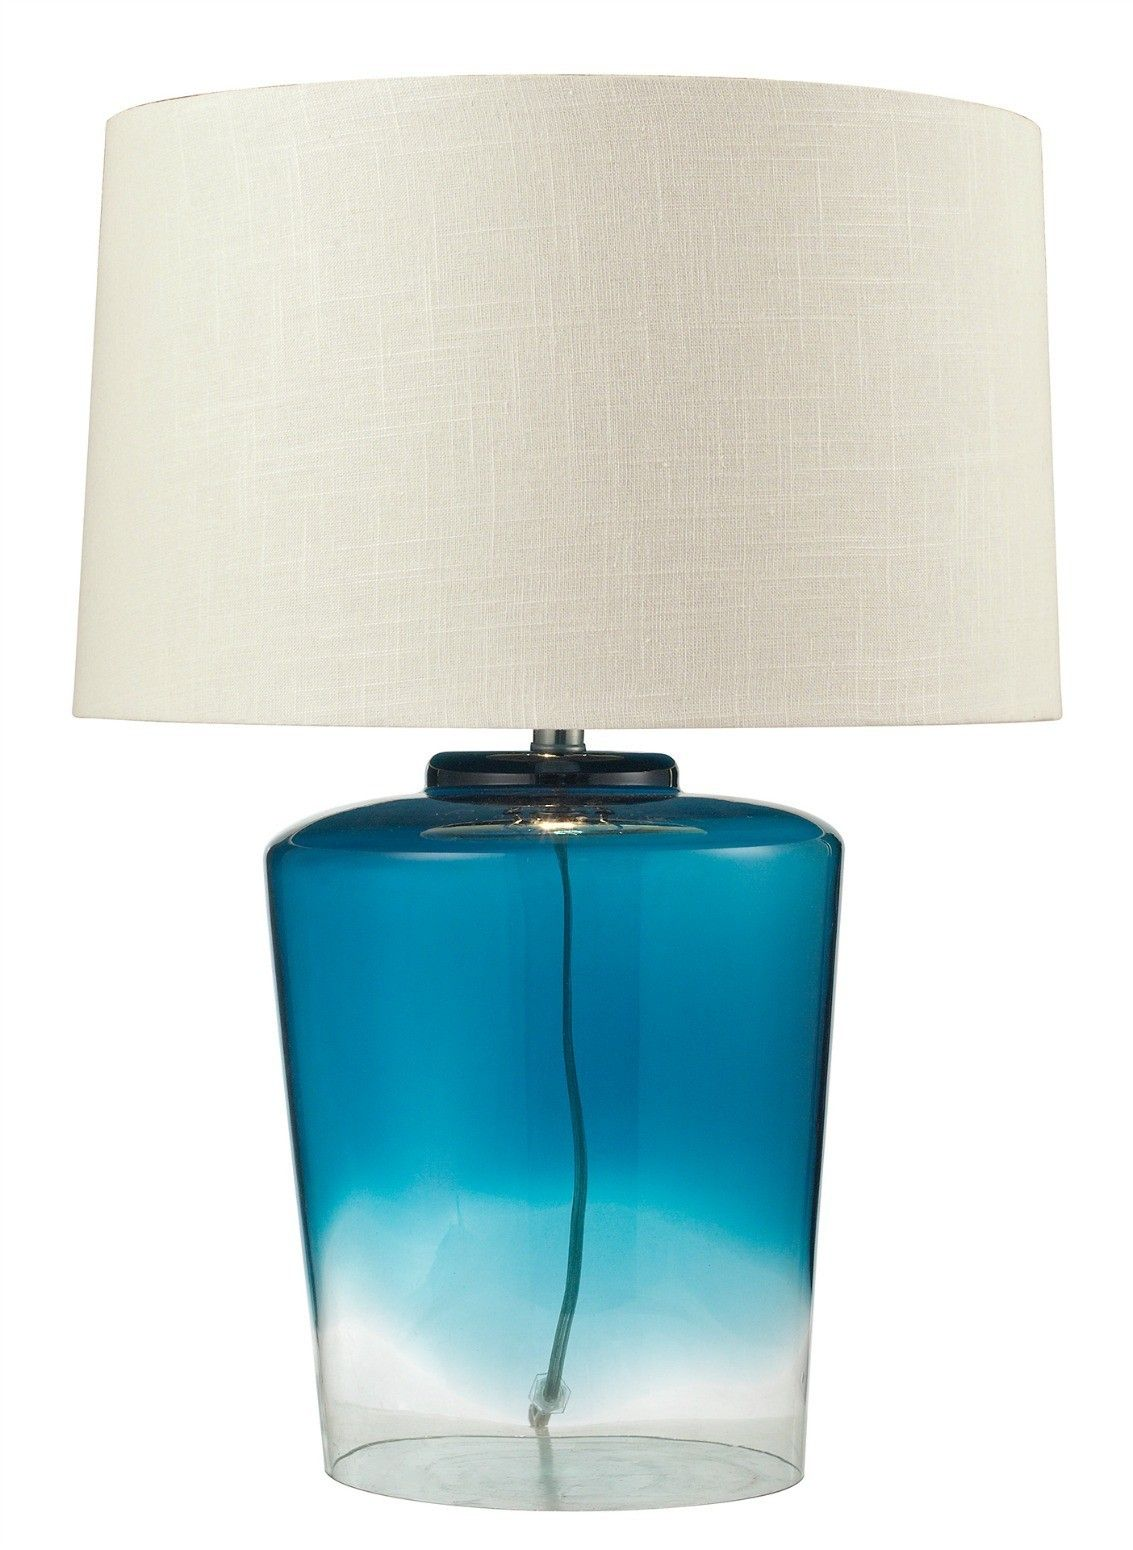 Blue glass table lamps  Blue Sea Glass Table Lamp  Doces Abobrinhas  Pinterest  Glass